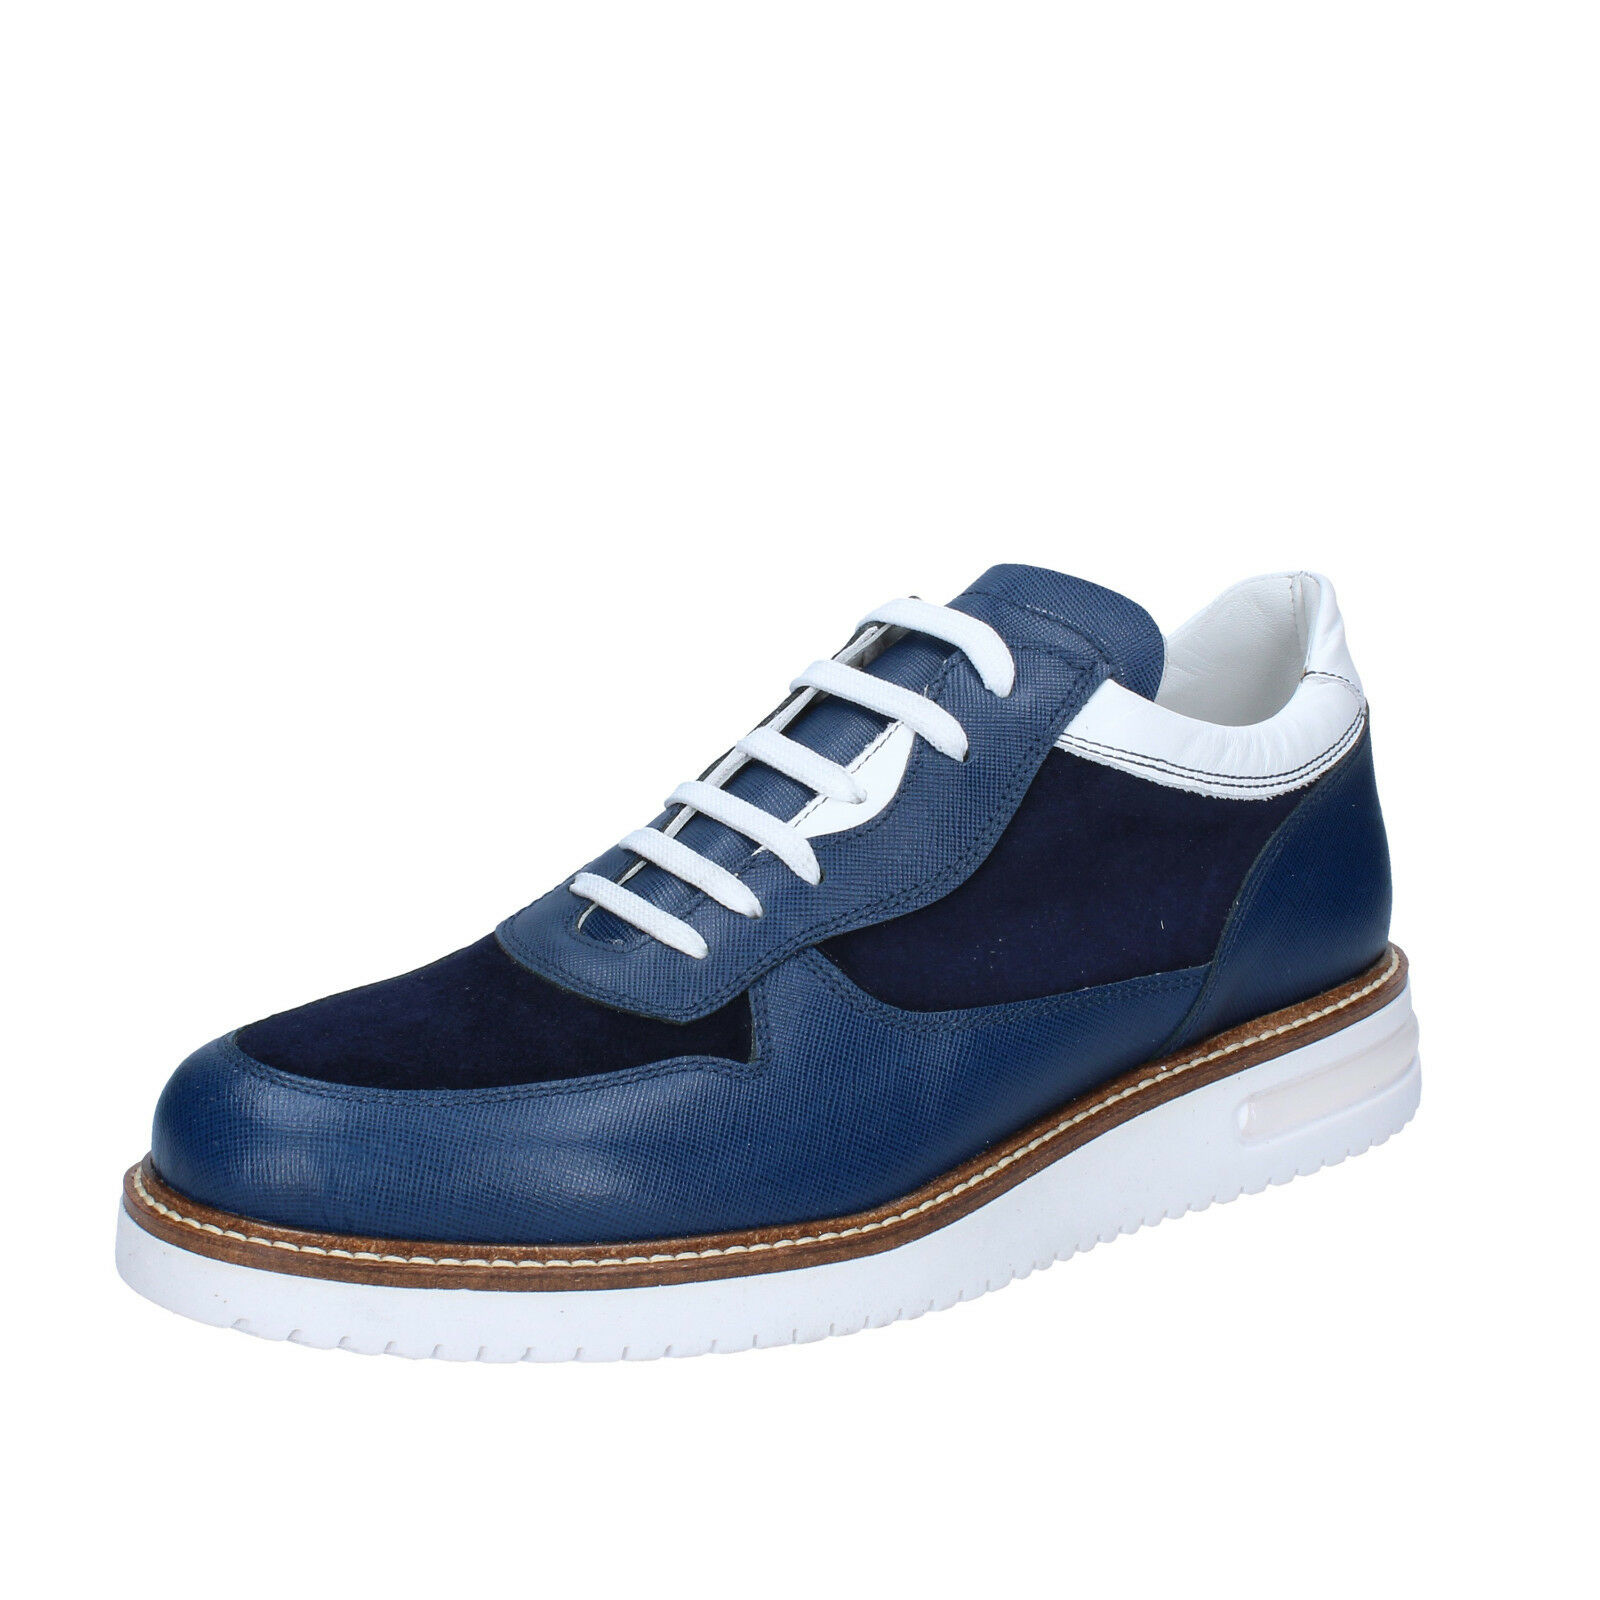 Men's shoes FDF SHOES 8 () elegant bluee leather suede BZ387-B